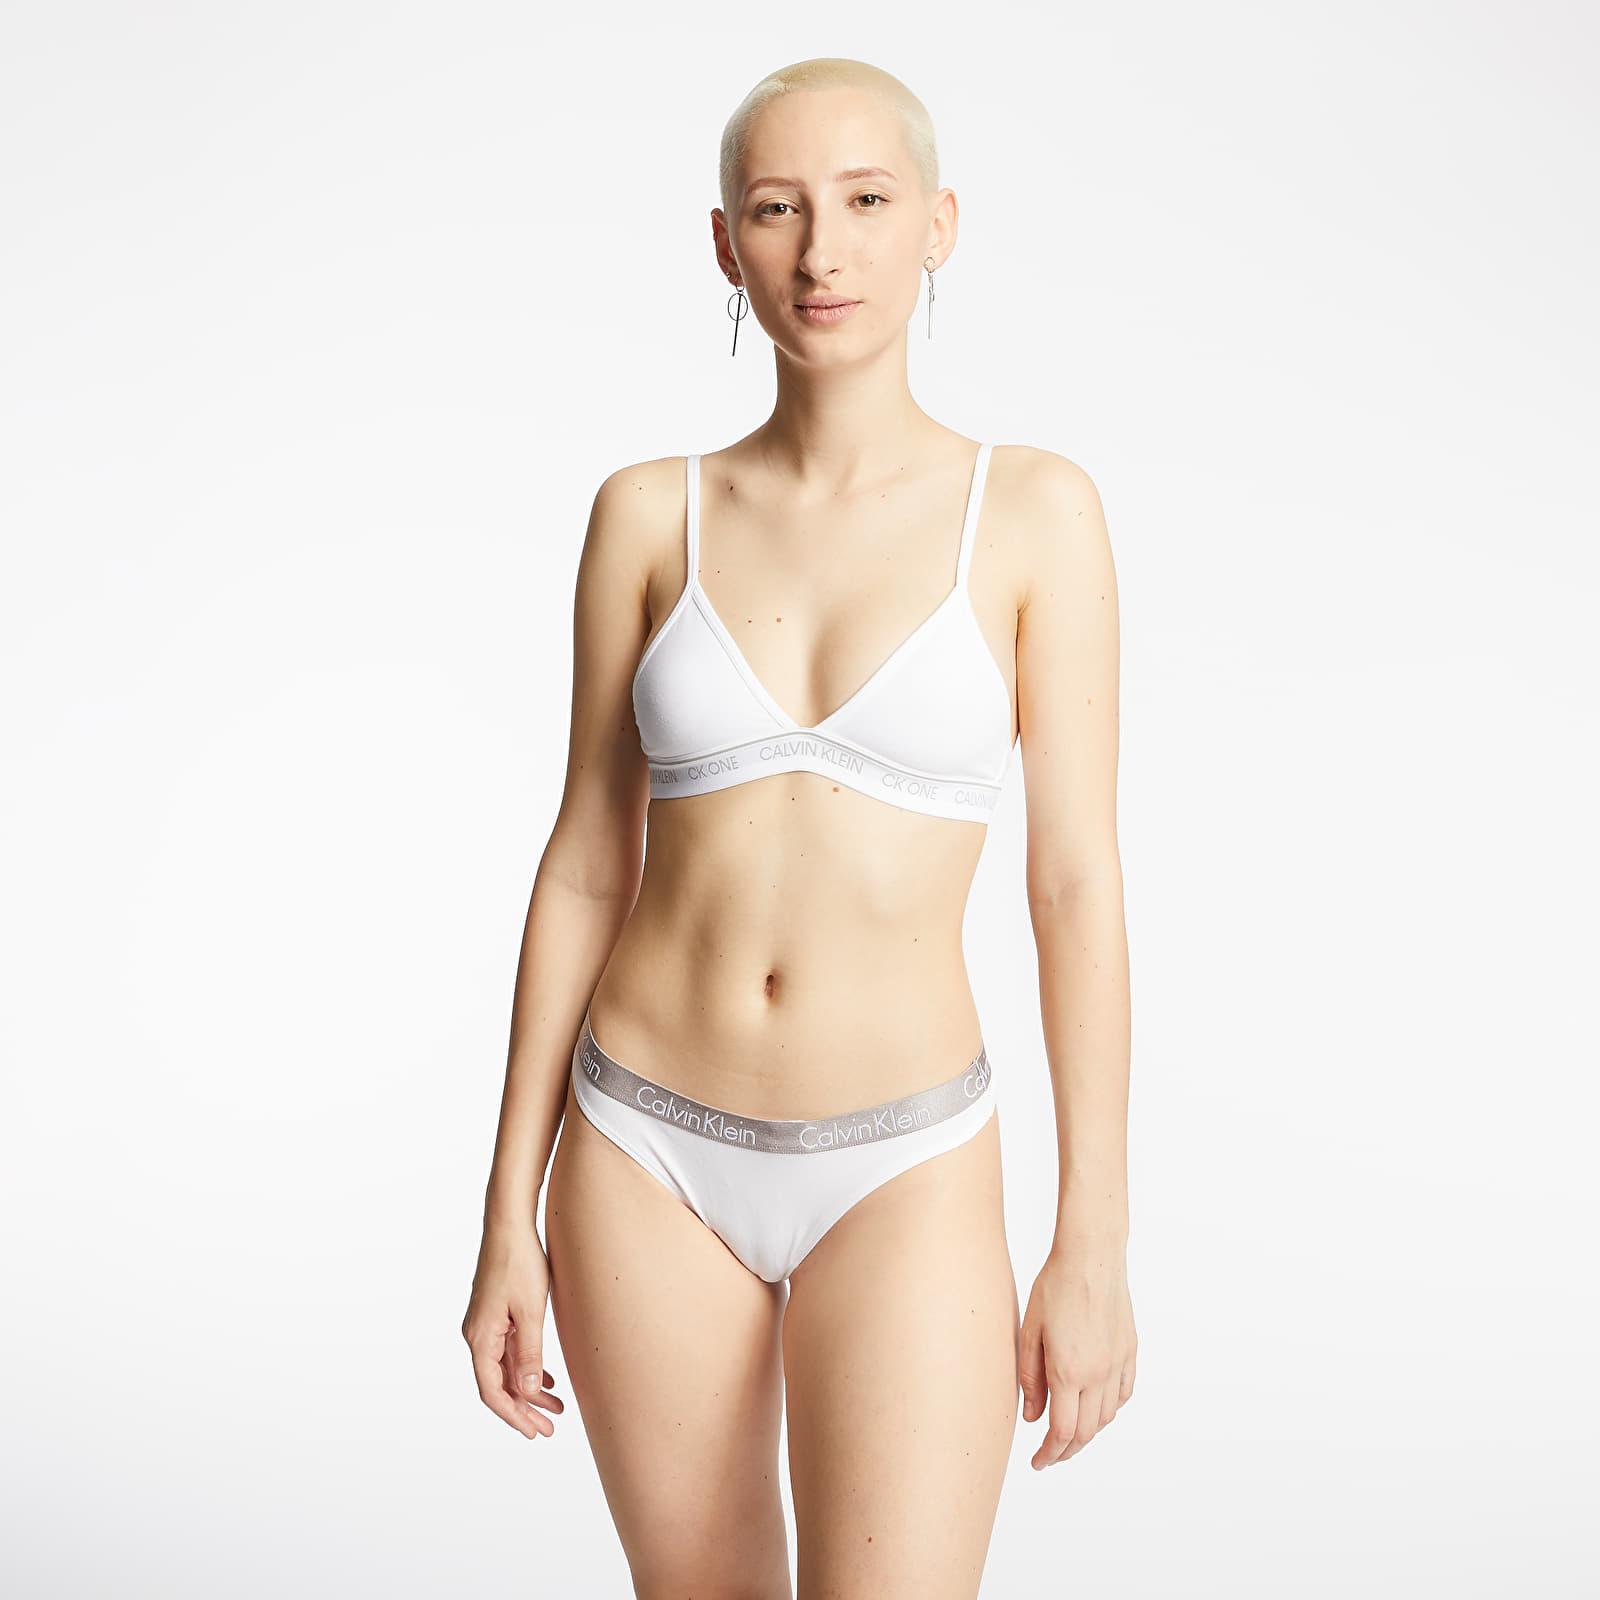 Women's underwear Calvin Klein 3Pack Thong Chrome/ Shoreline/ White